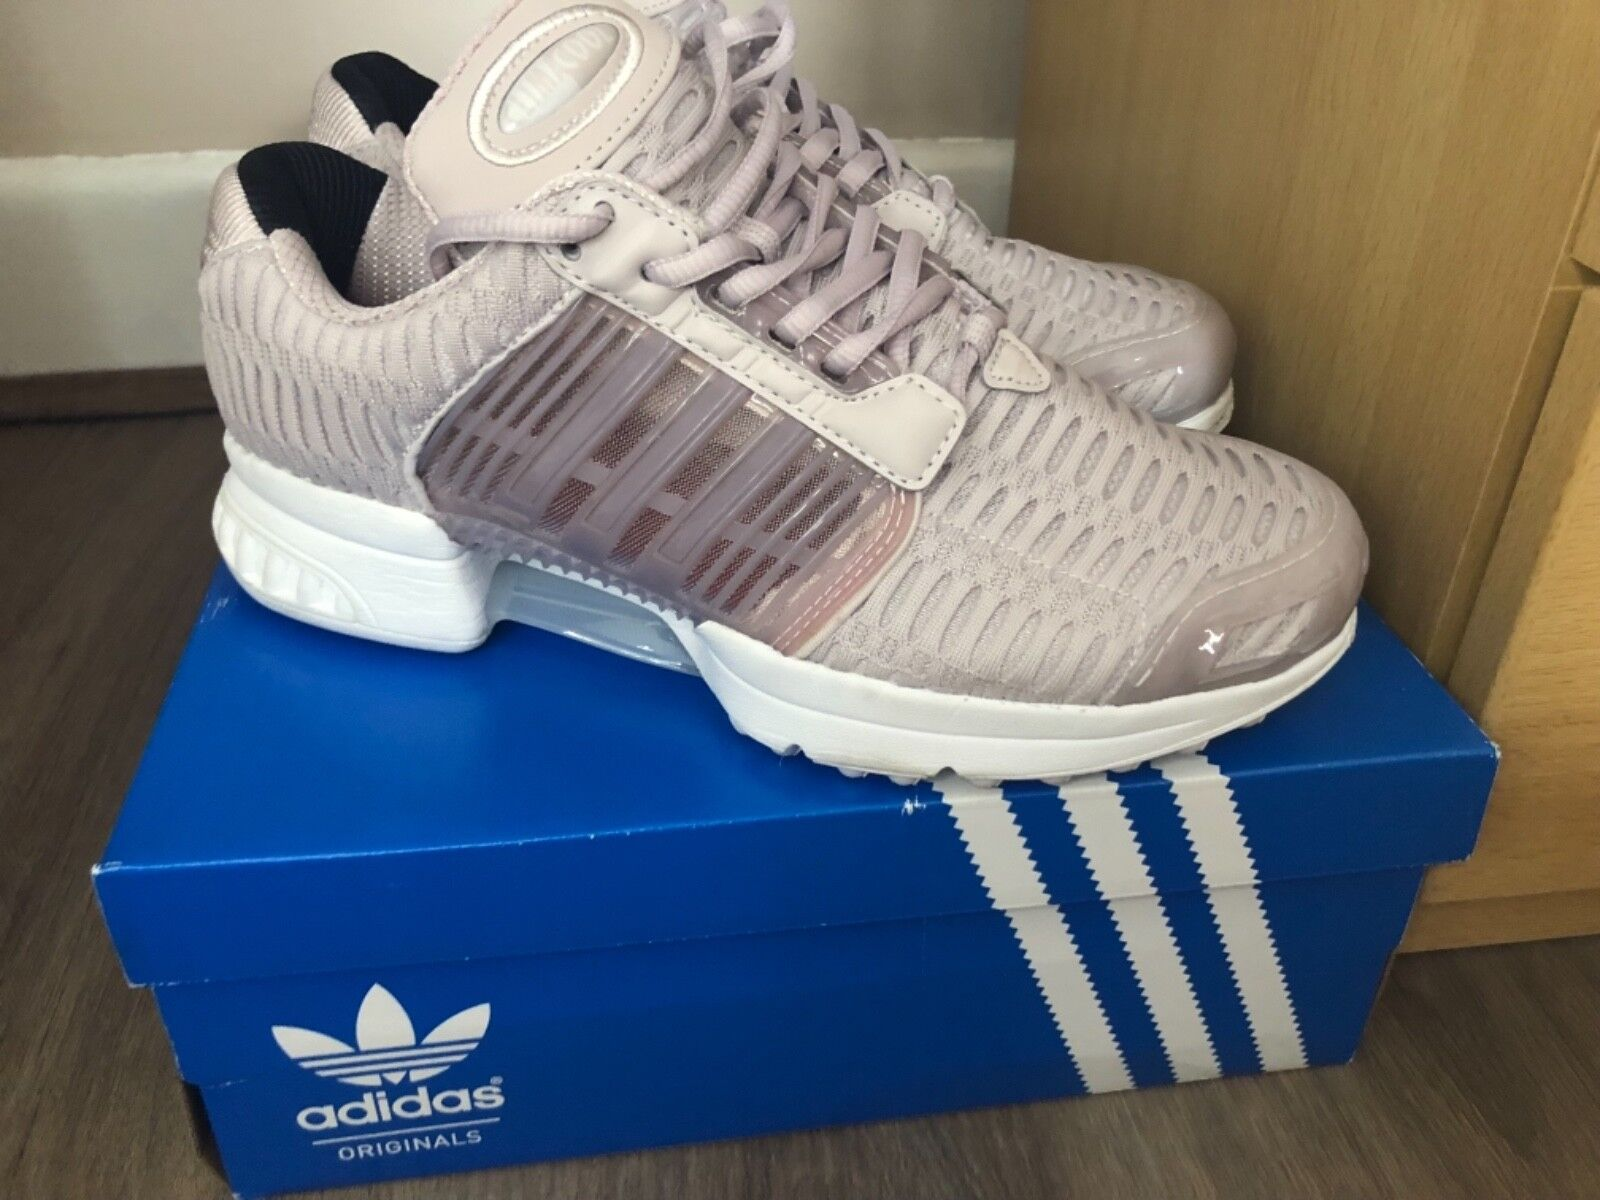 Adidas Climacool purplec trainers UK size 6.5